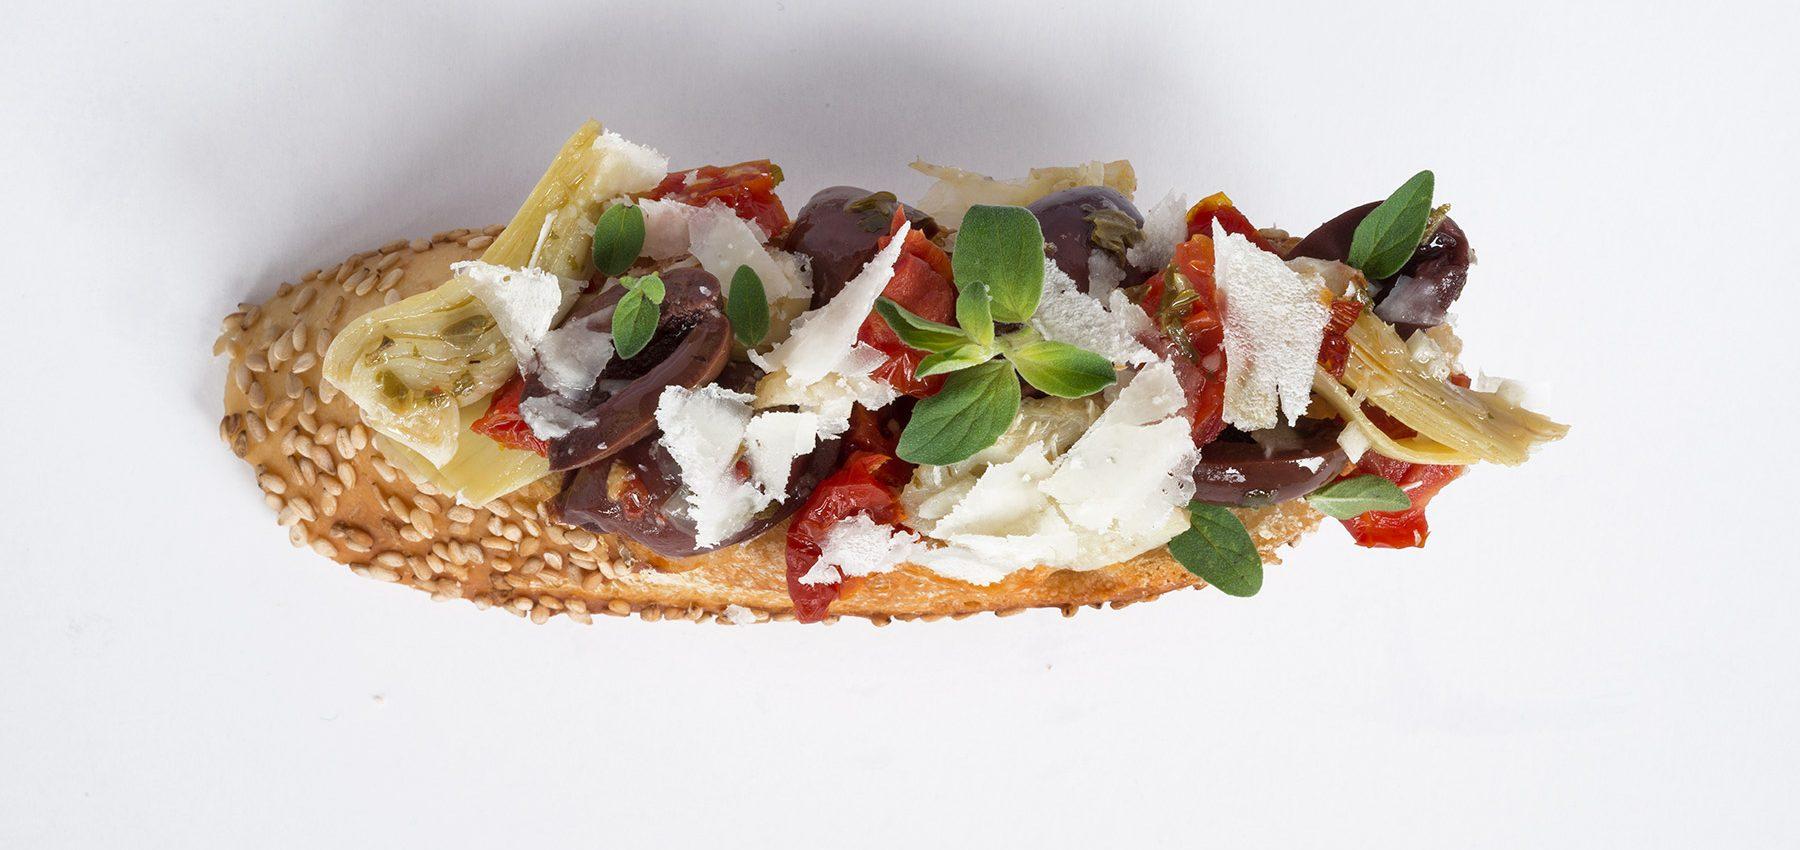 Artichoke and Olive Crostini Home » Artichoke and Olive Crostini